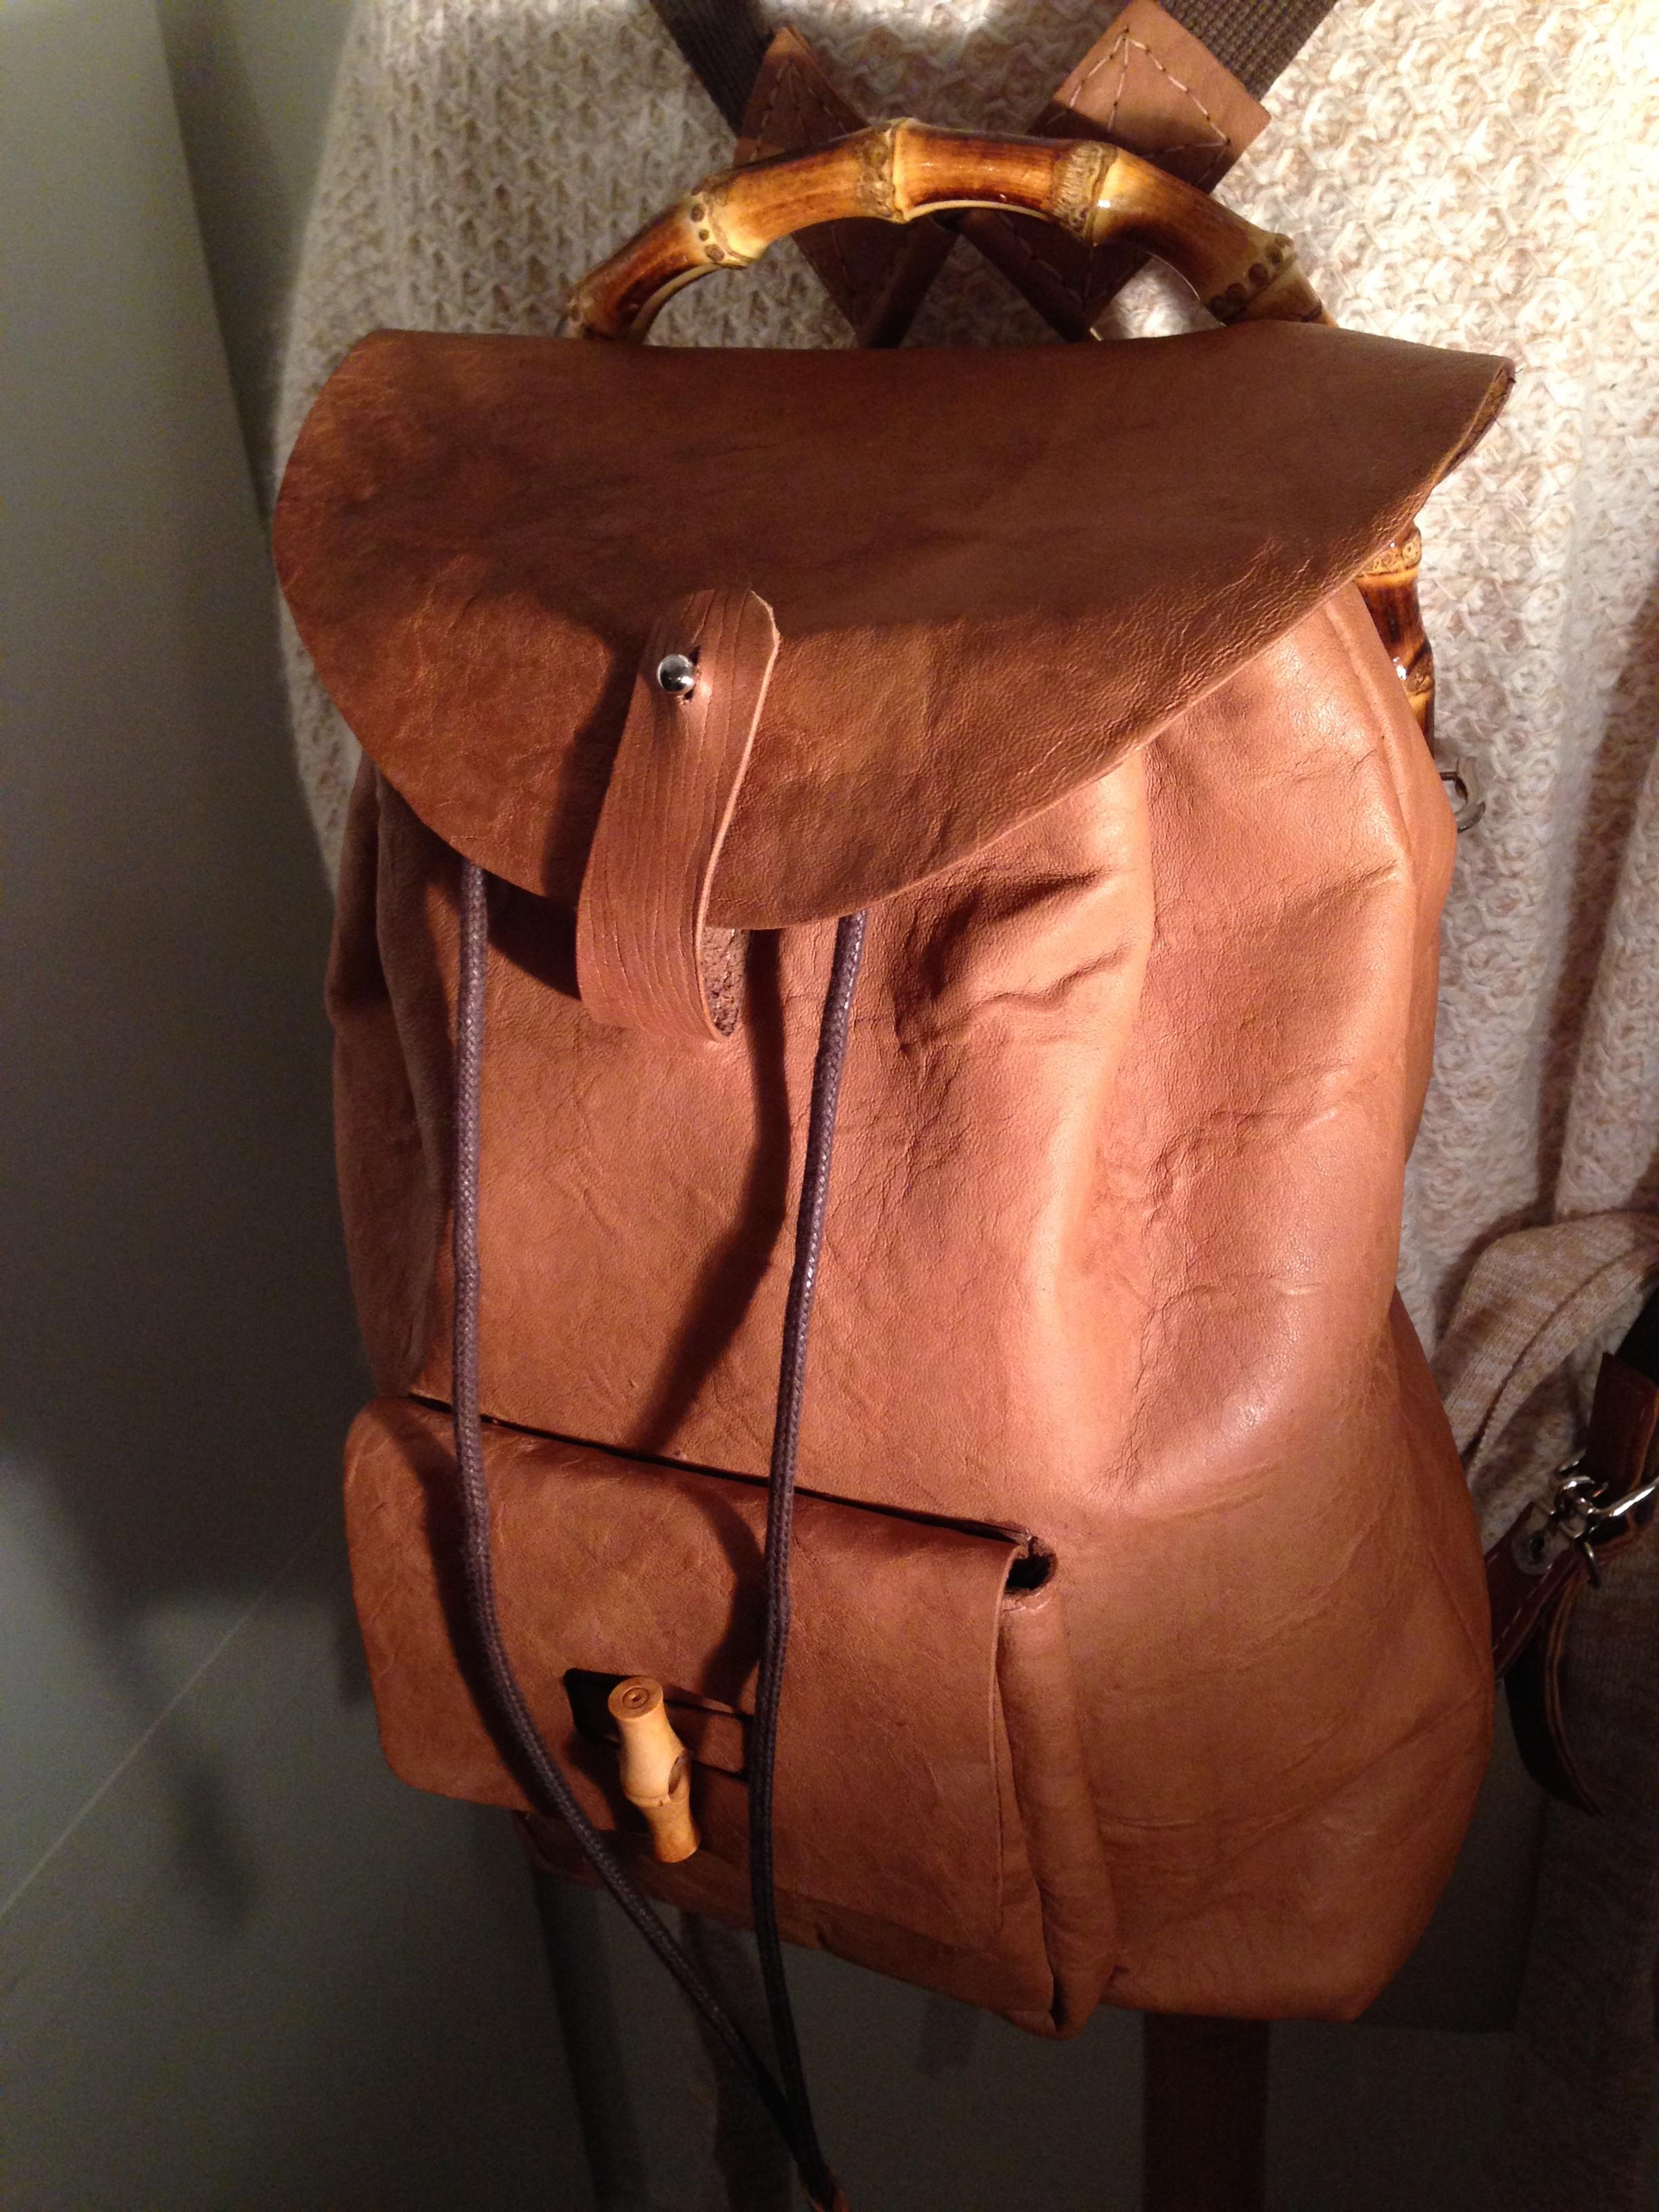 Couture coudre un sac dos en cuir lagouagouache - Patron de sac a main en cuir gratuit ...